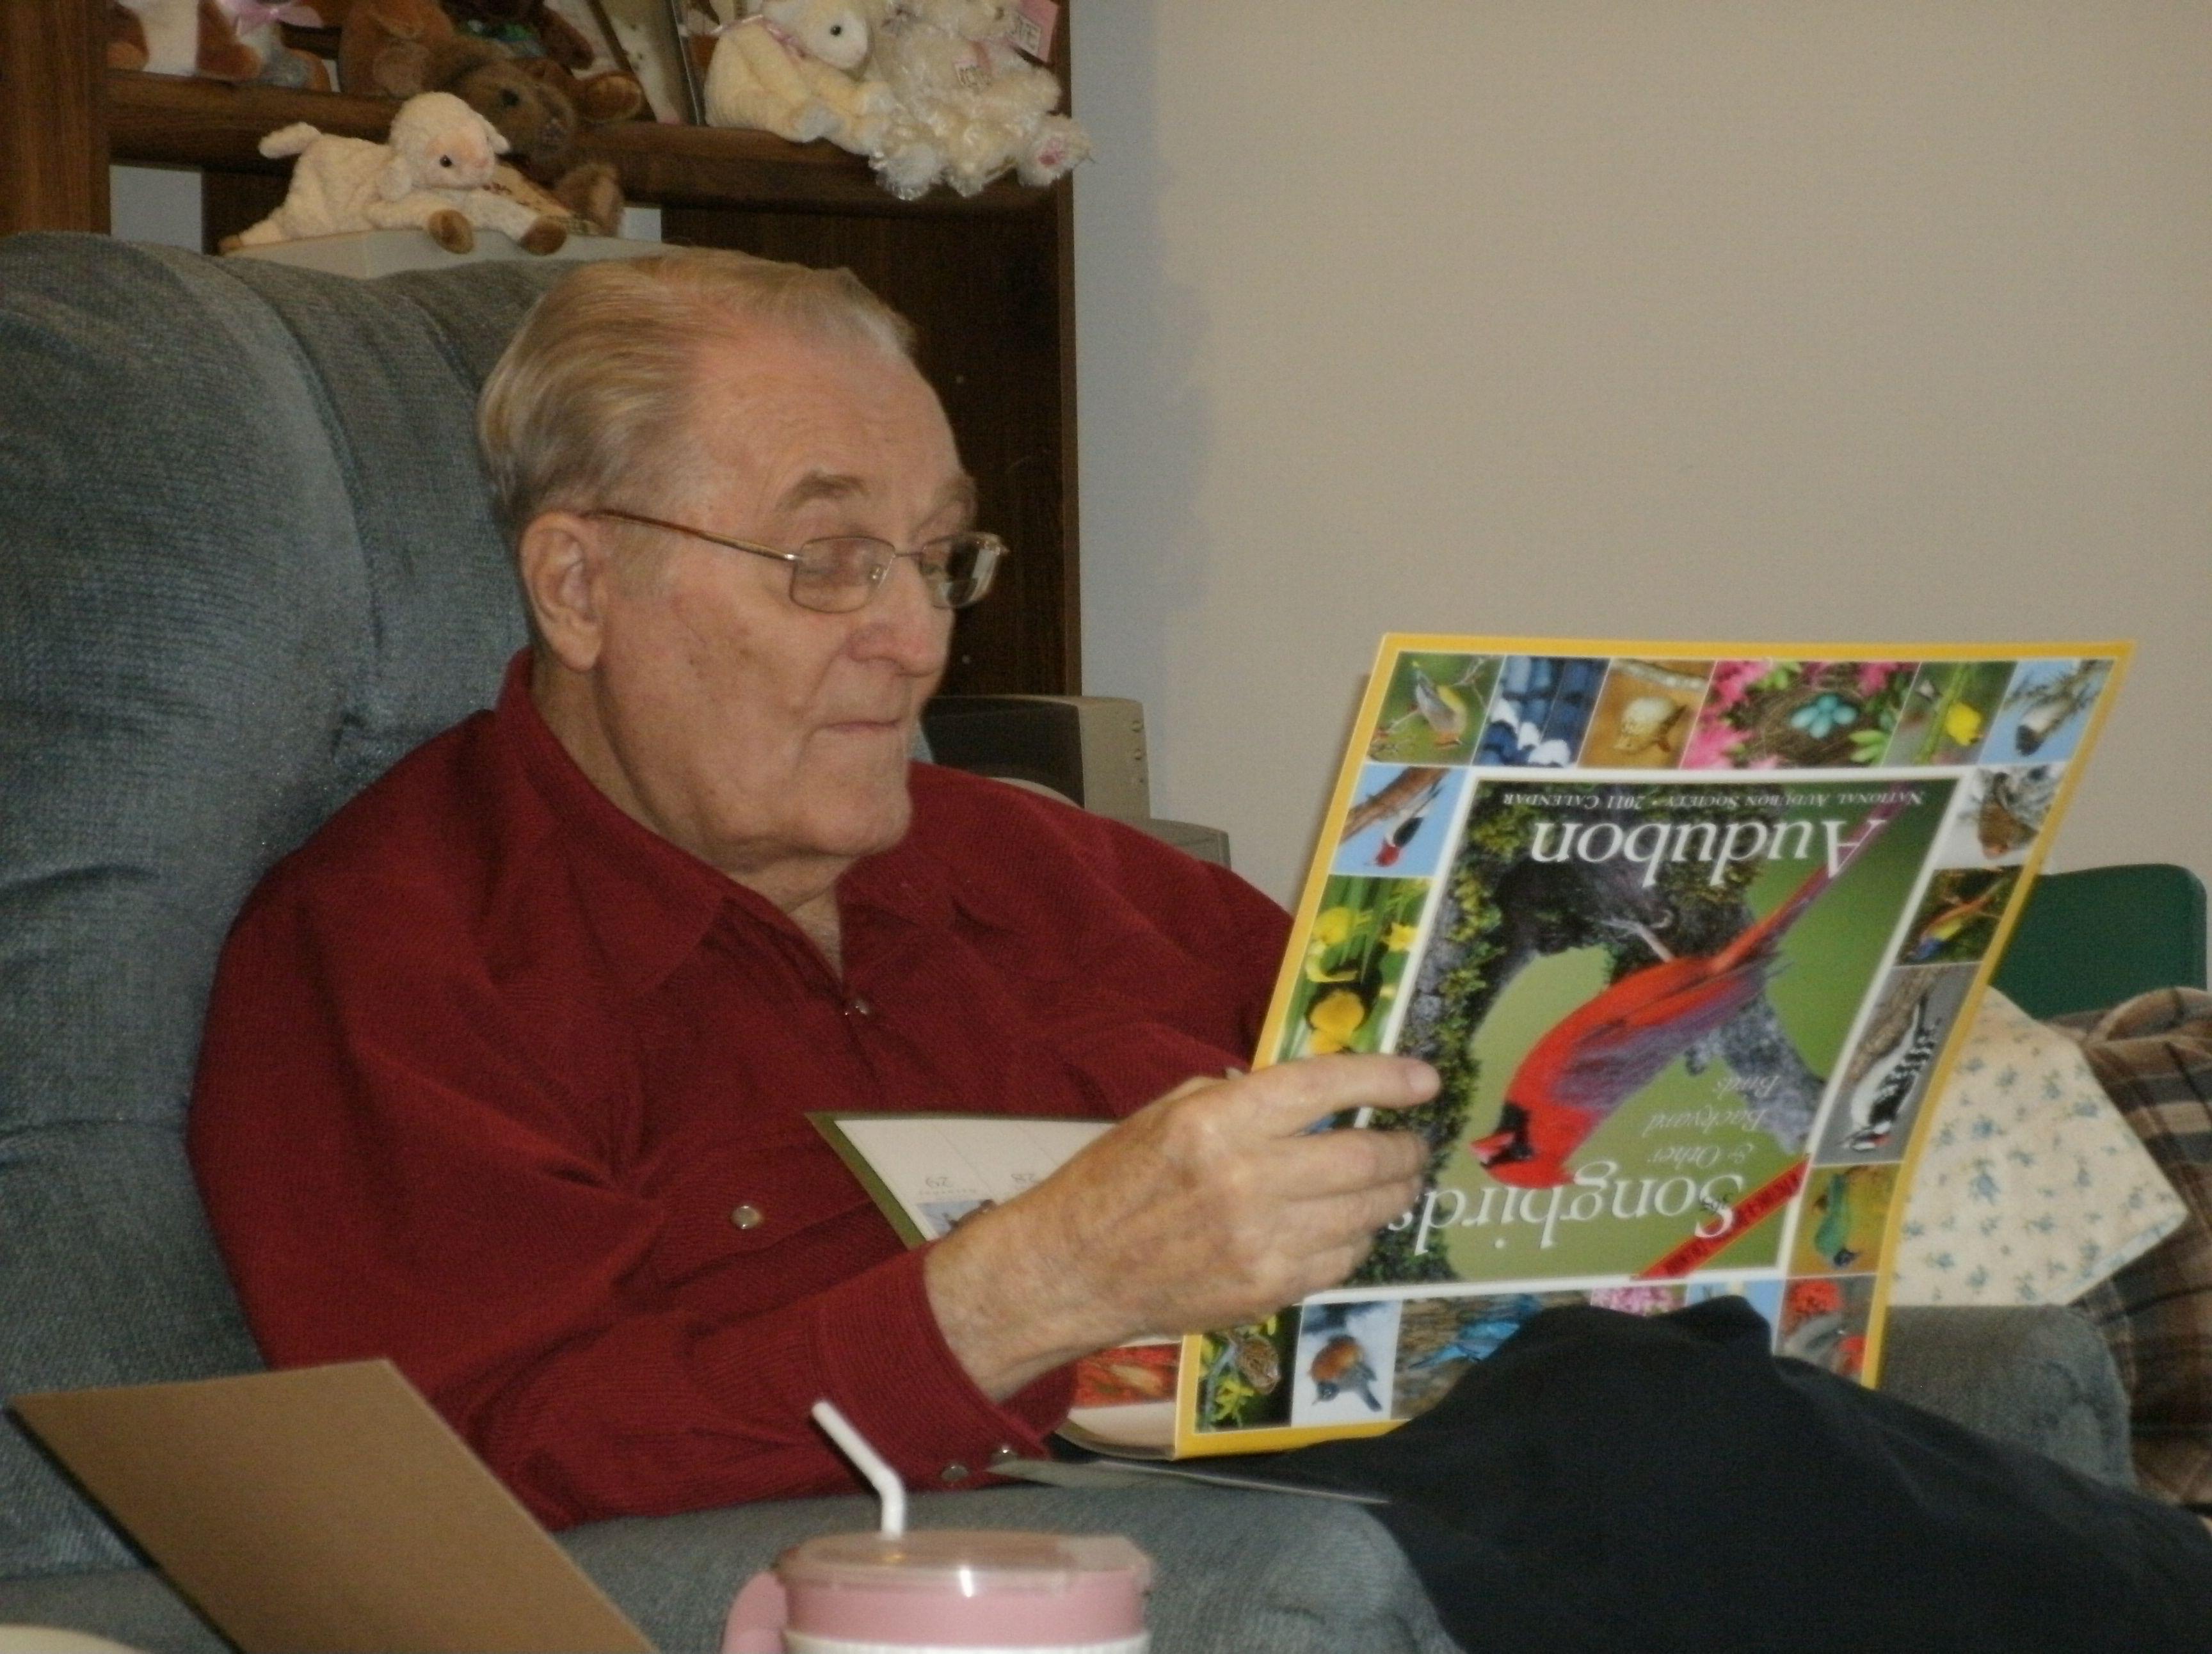 Grandpa Book cover, Design research, Makeup designs